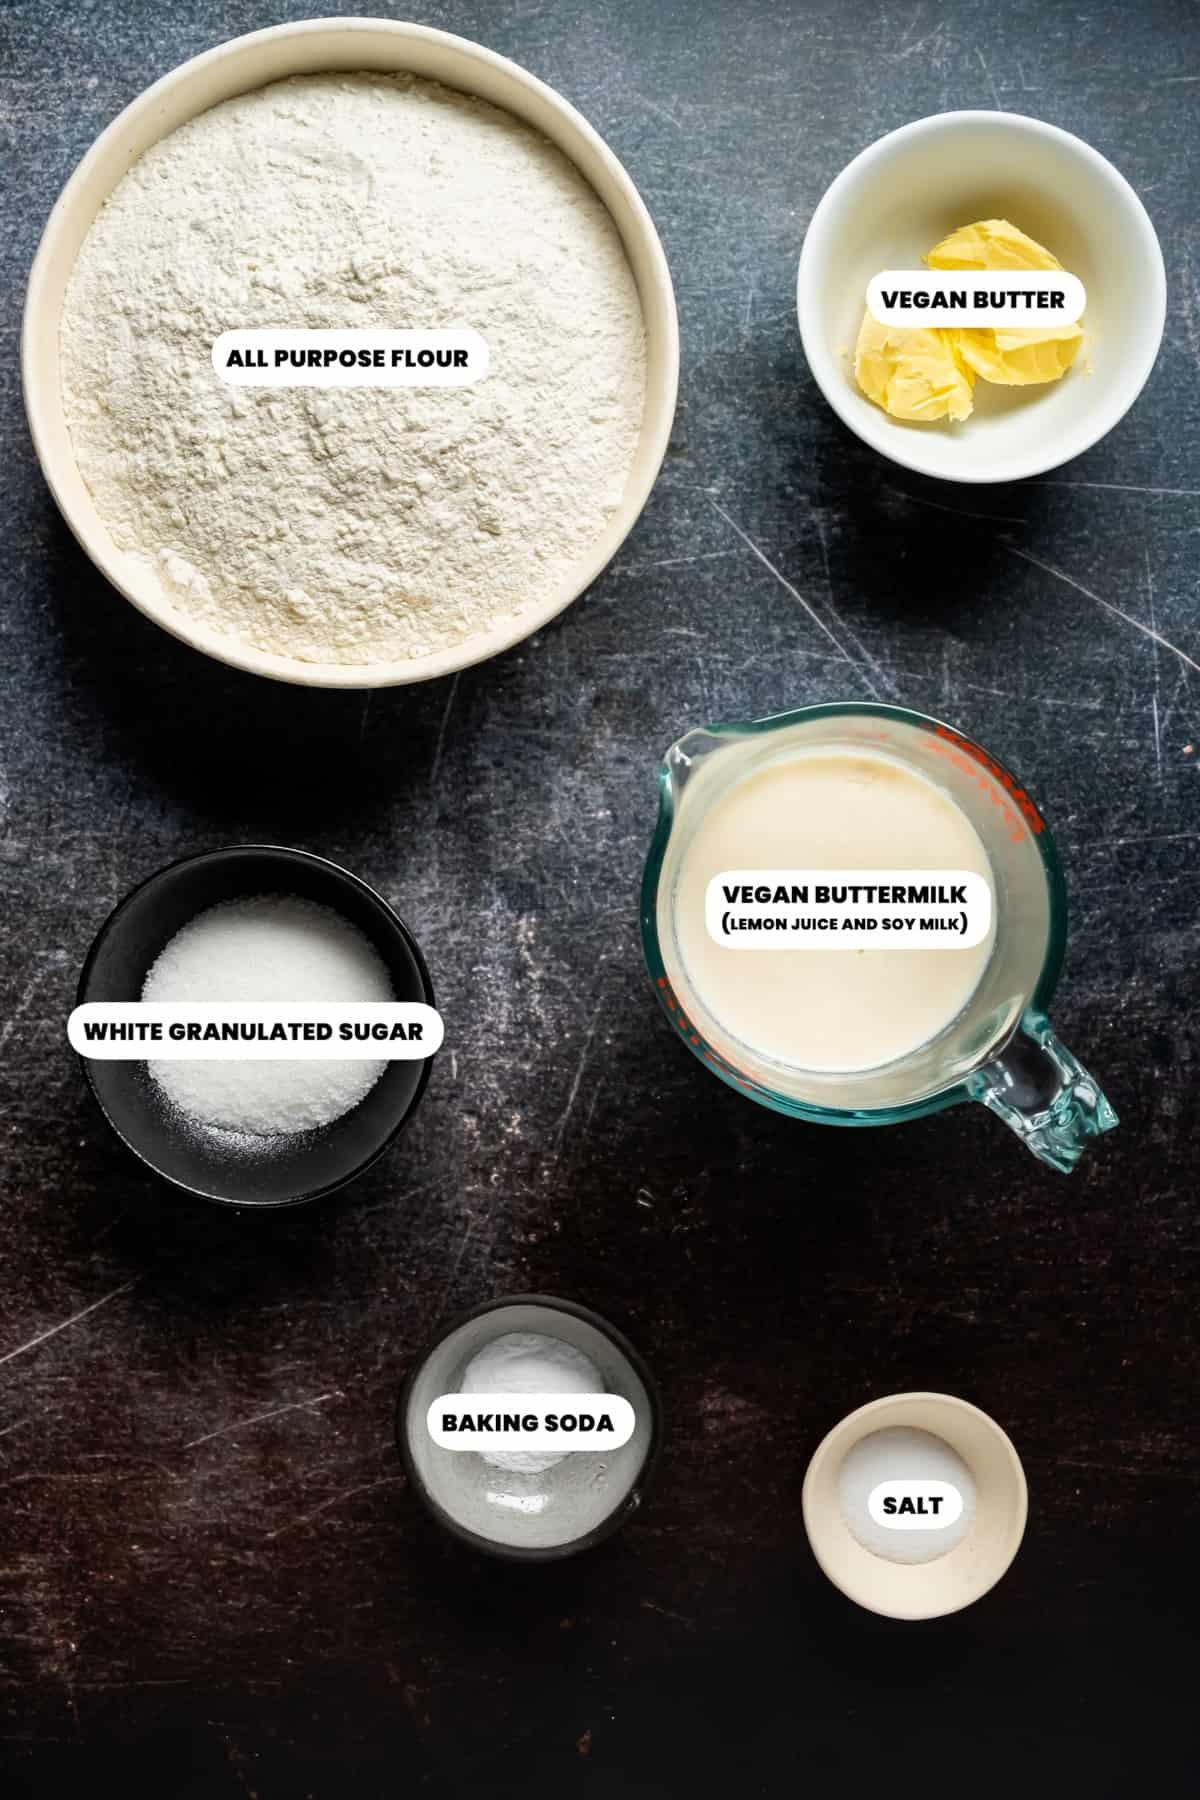 Photo of the ingredients needed to make vegan soda bread.